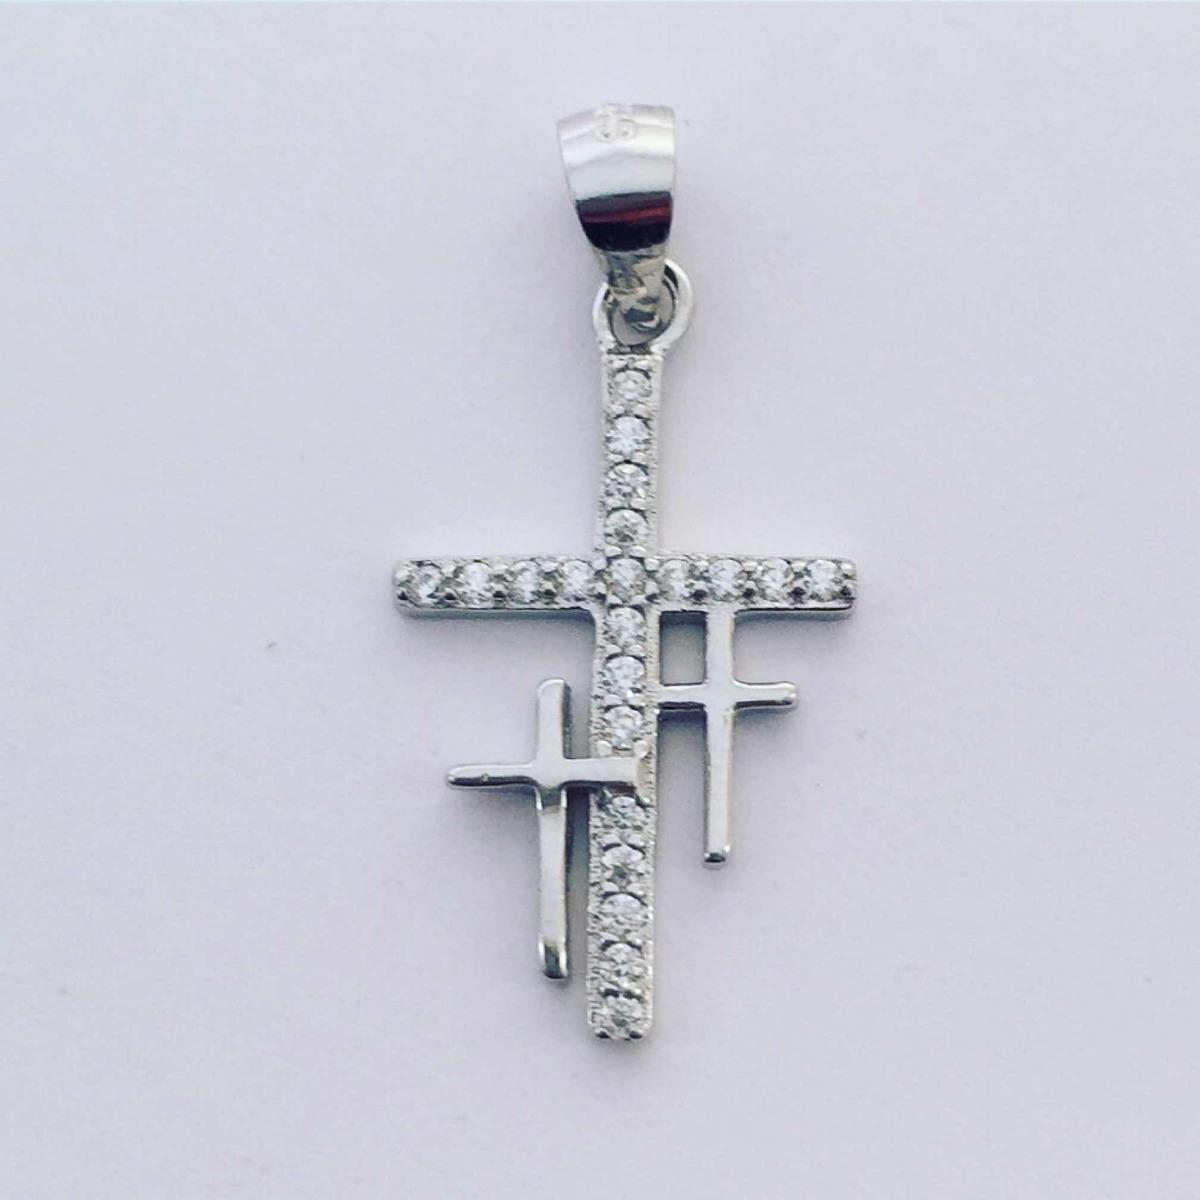 114f9e2bcfd0 Dije Tres Cruces Cruz En Plata 925 Y Zirconias Inspira Joyas -   450 ...